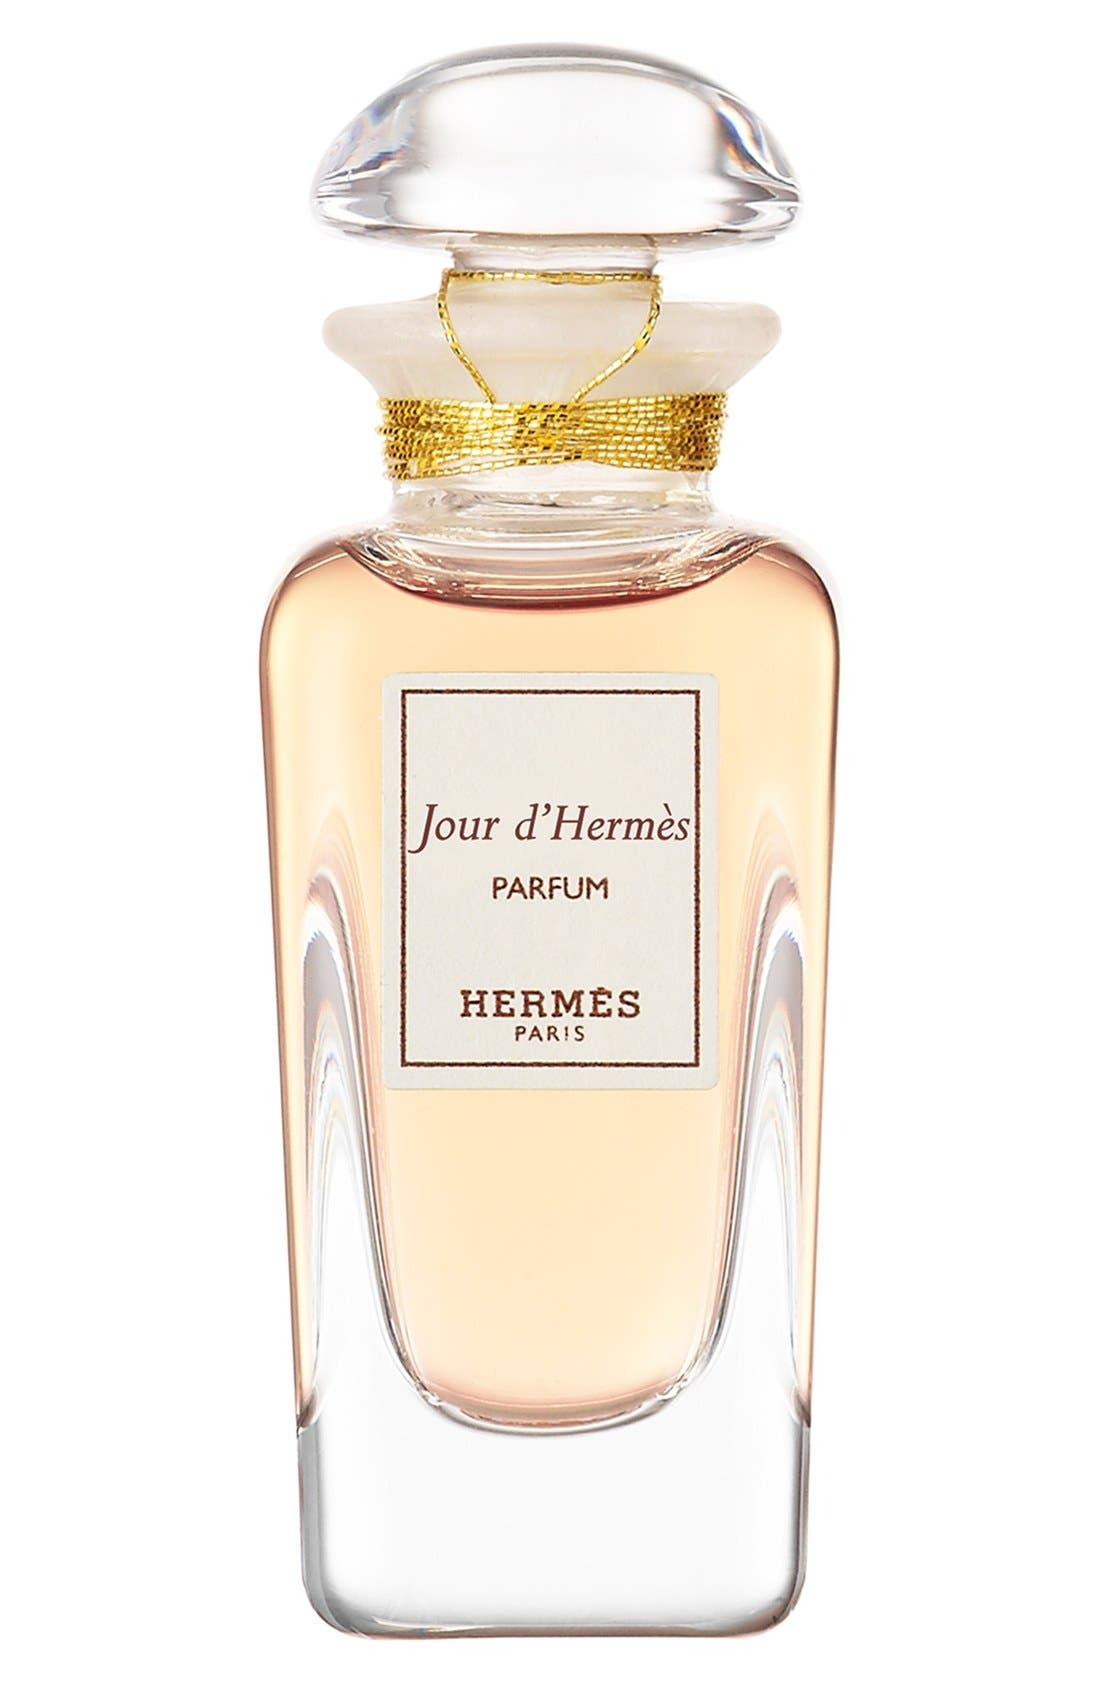 Hermès Jour d'Hermès - Pure perfume